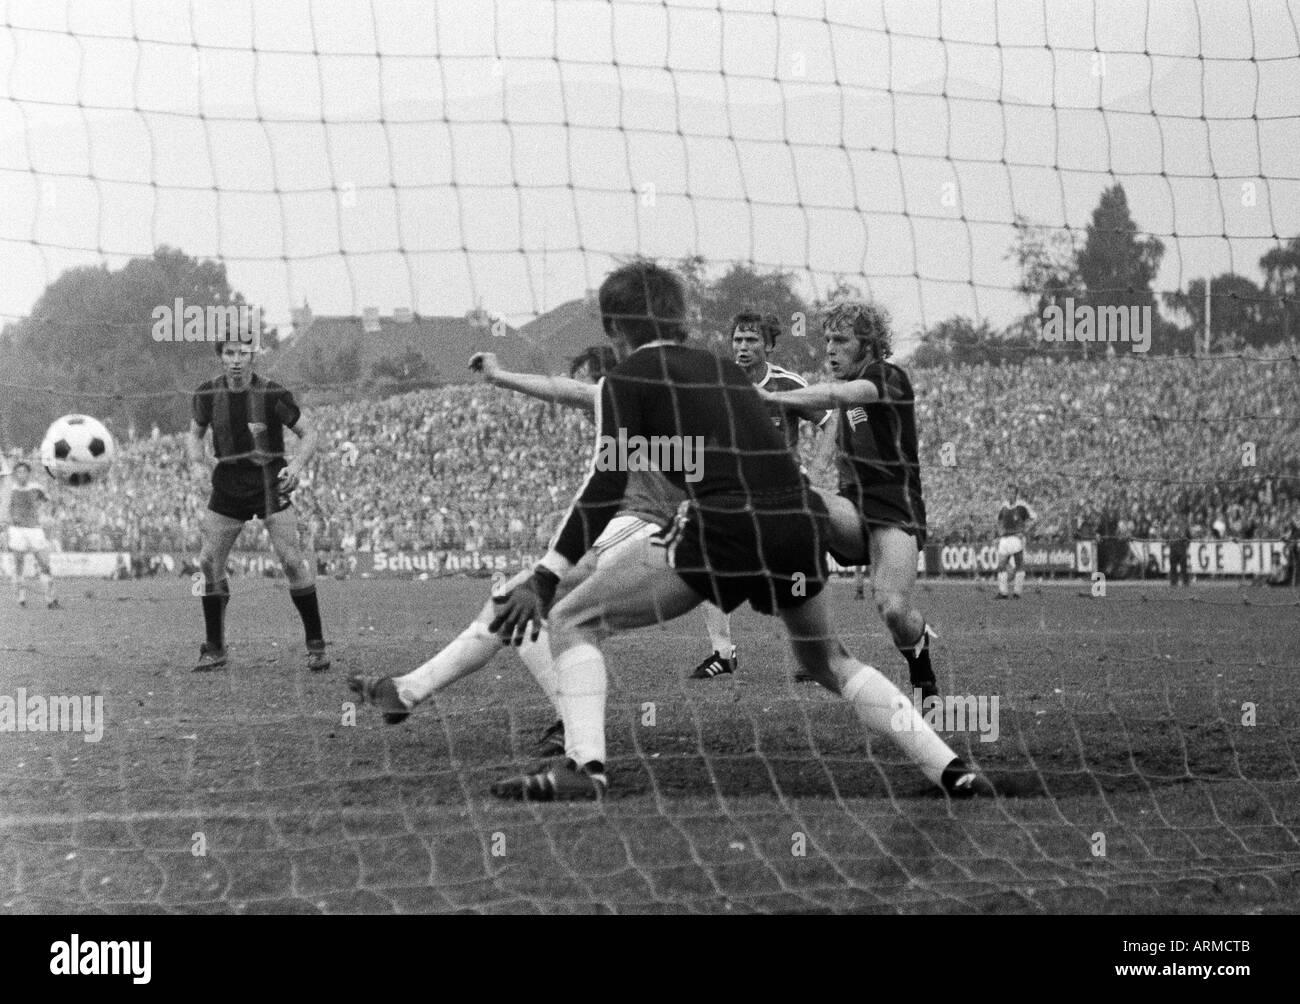 football, Regionalliga 1970/1971, promotion match to the Bundesliga 1971/1972, VfL Bochum versus Tasmania 1900 Berlin 4:2, Stadium an der Castroper Strasse in Bochum, scene of the match, f.l.t.r. Gerd Gretzler (Berlin), keeper Hans Juergen Bradler (Bochum - Stock Image